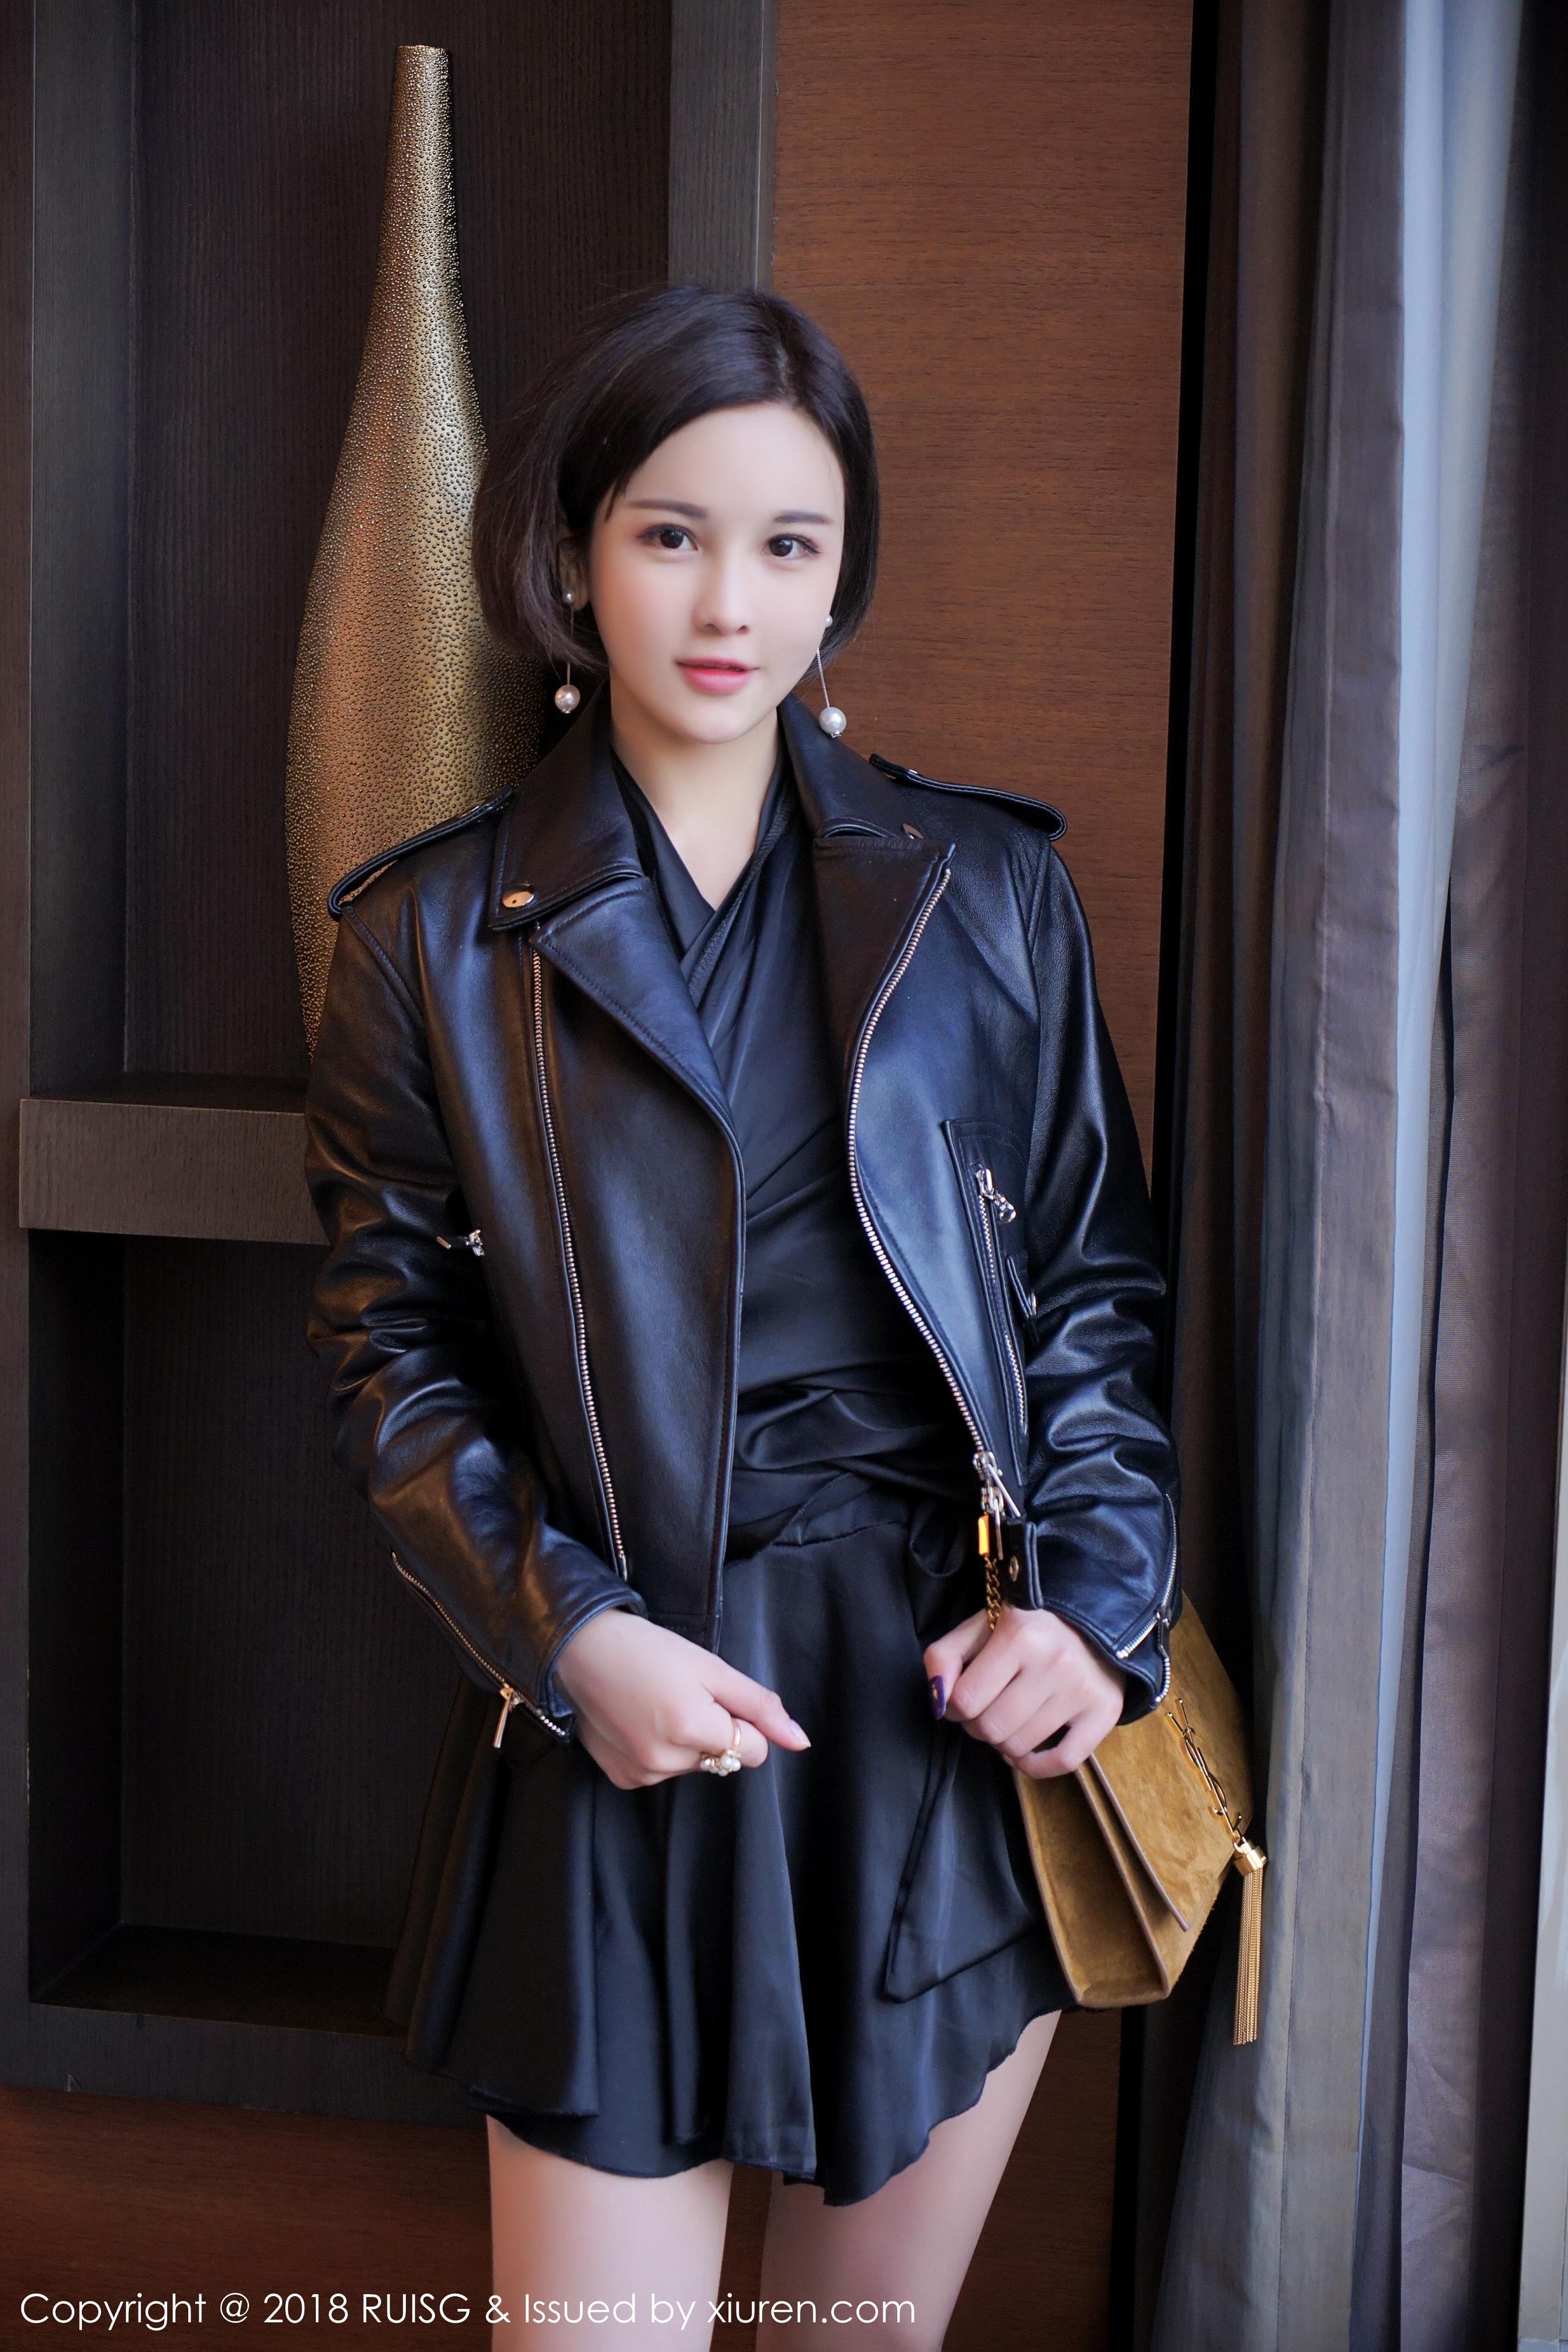 [RUISG瑞丝馆]RSG20180105VOL0037 米粒sweet 黑色外套加黑色短裙与黑色性感情趣内衣私房写真集